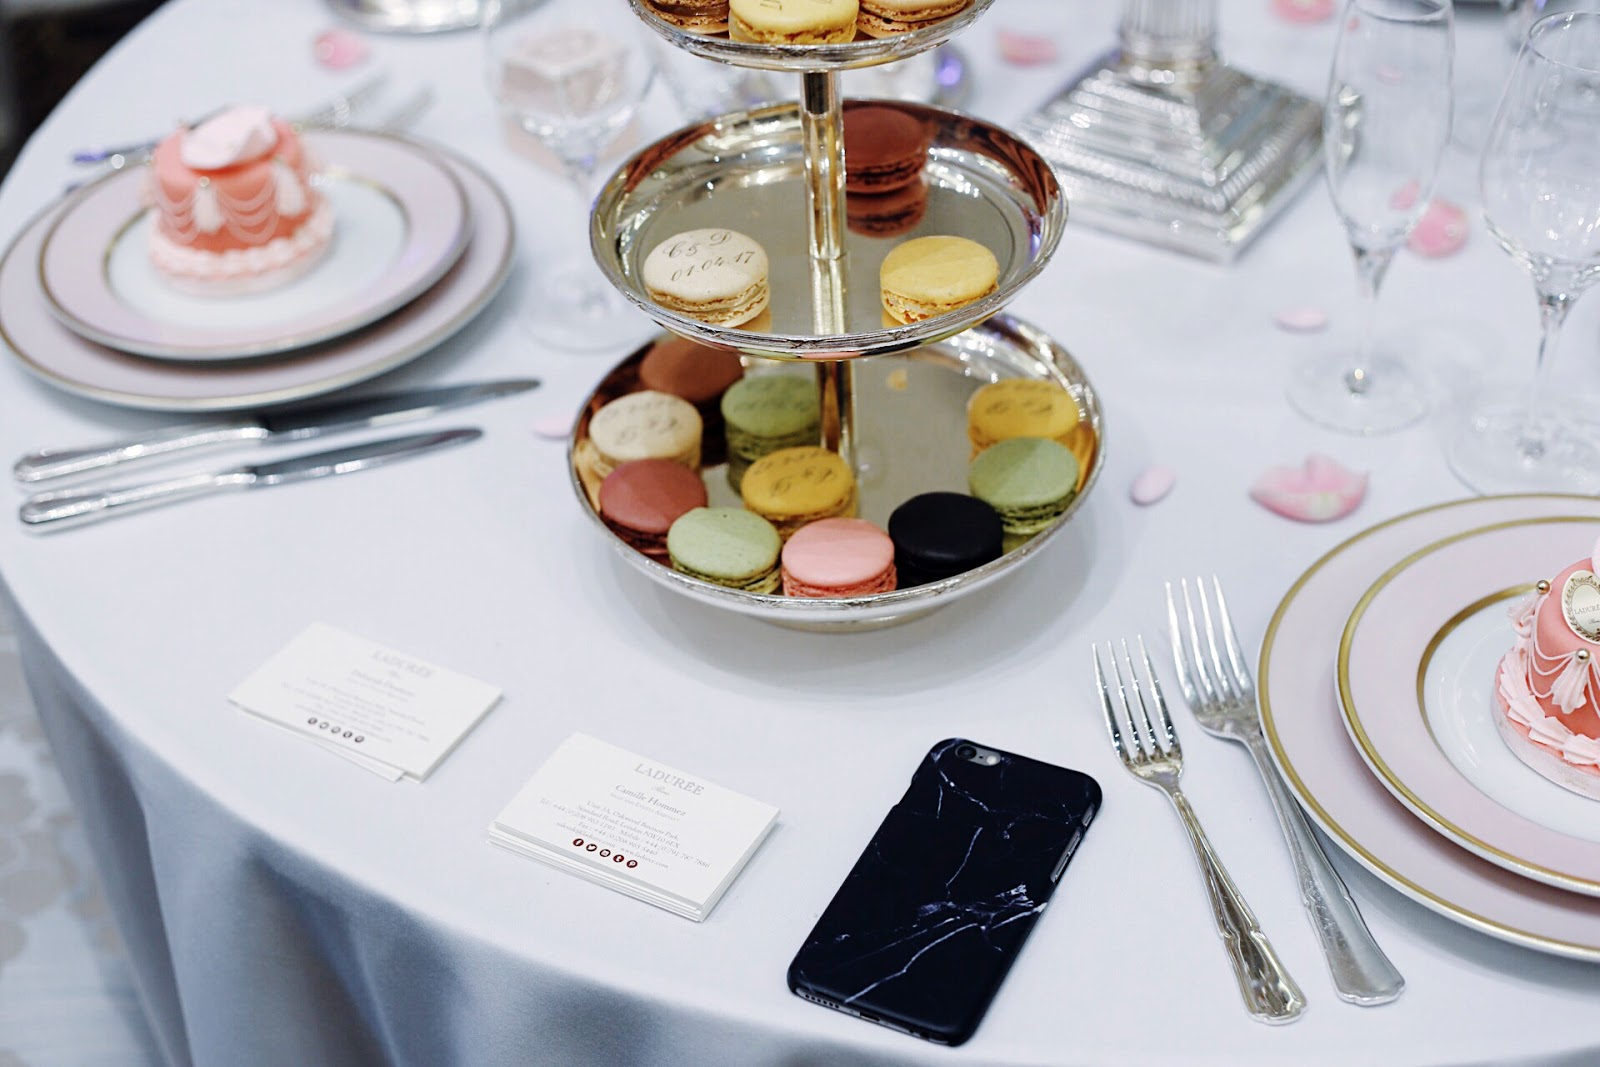 wedding atelier, wedding show london, the quintessentially wedding atelier, quintessentially events, quintessential, london based fashion blogger, london based style blogger,